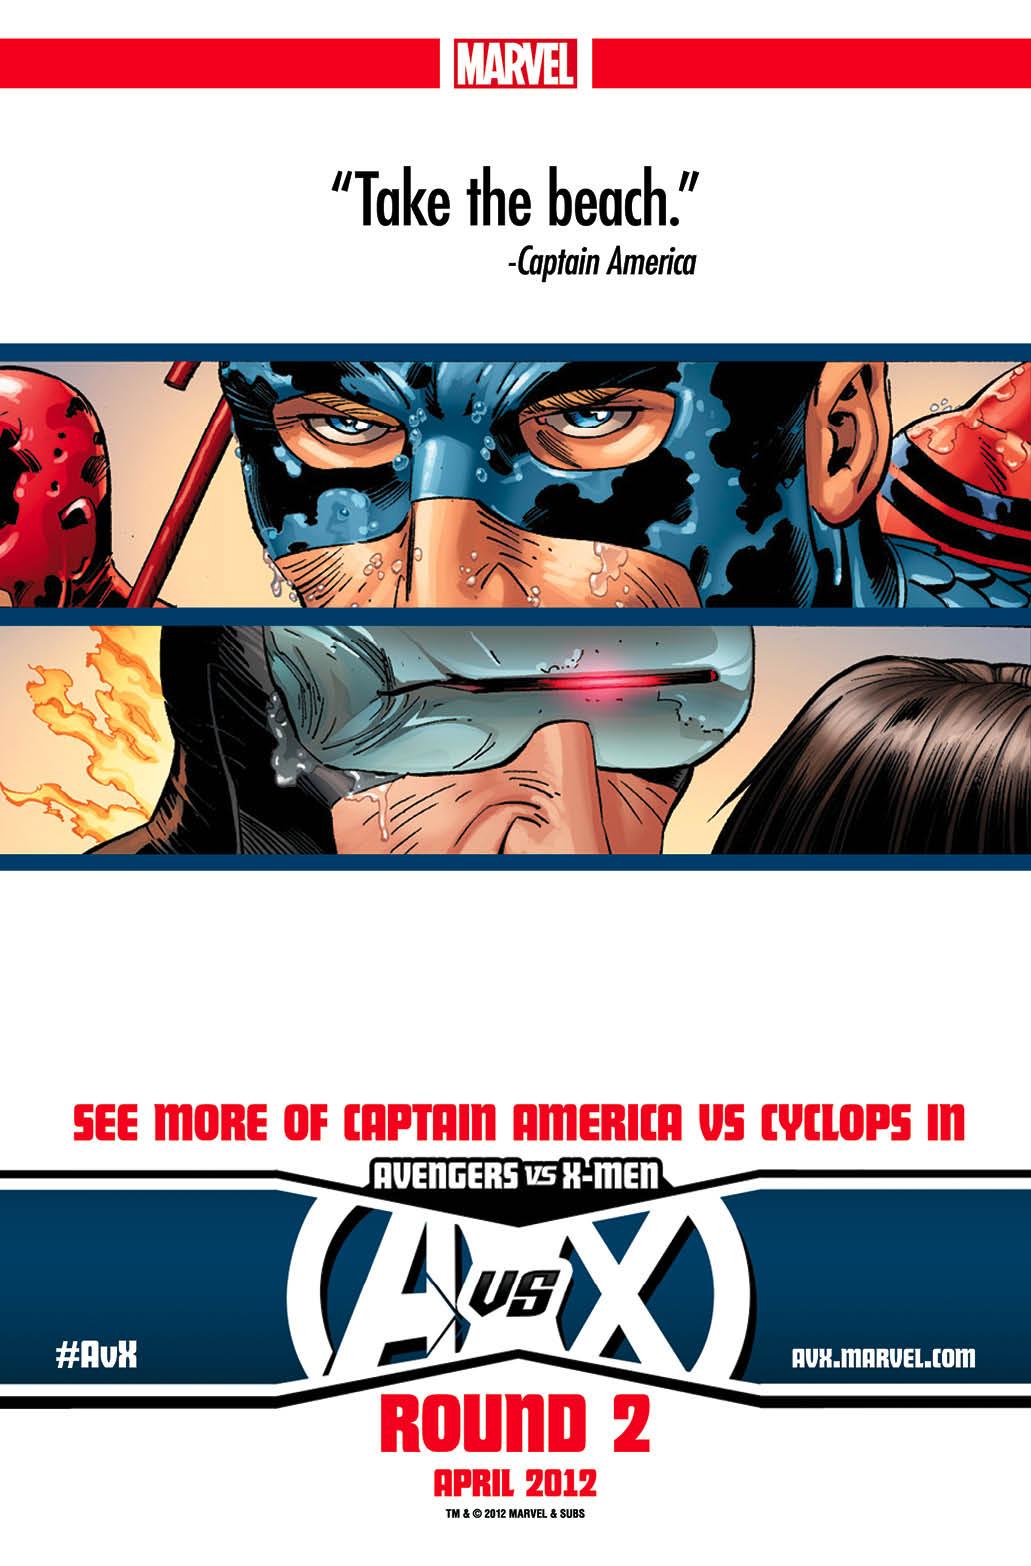 AvX2_Teasers3 Emma Frost gives Iron Man diamonds in AVENGERS VS X-MEN #2